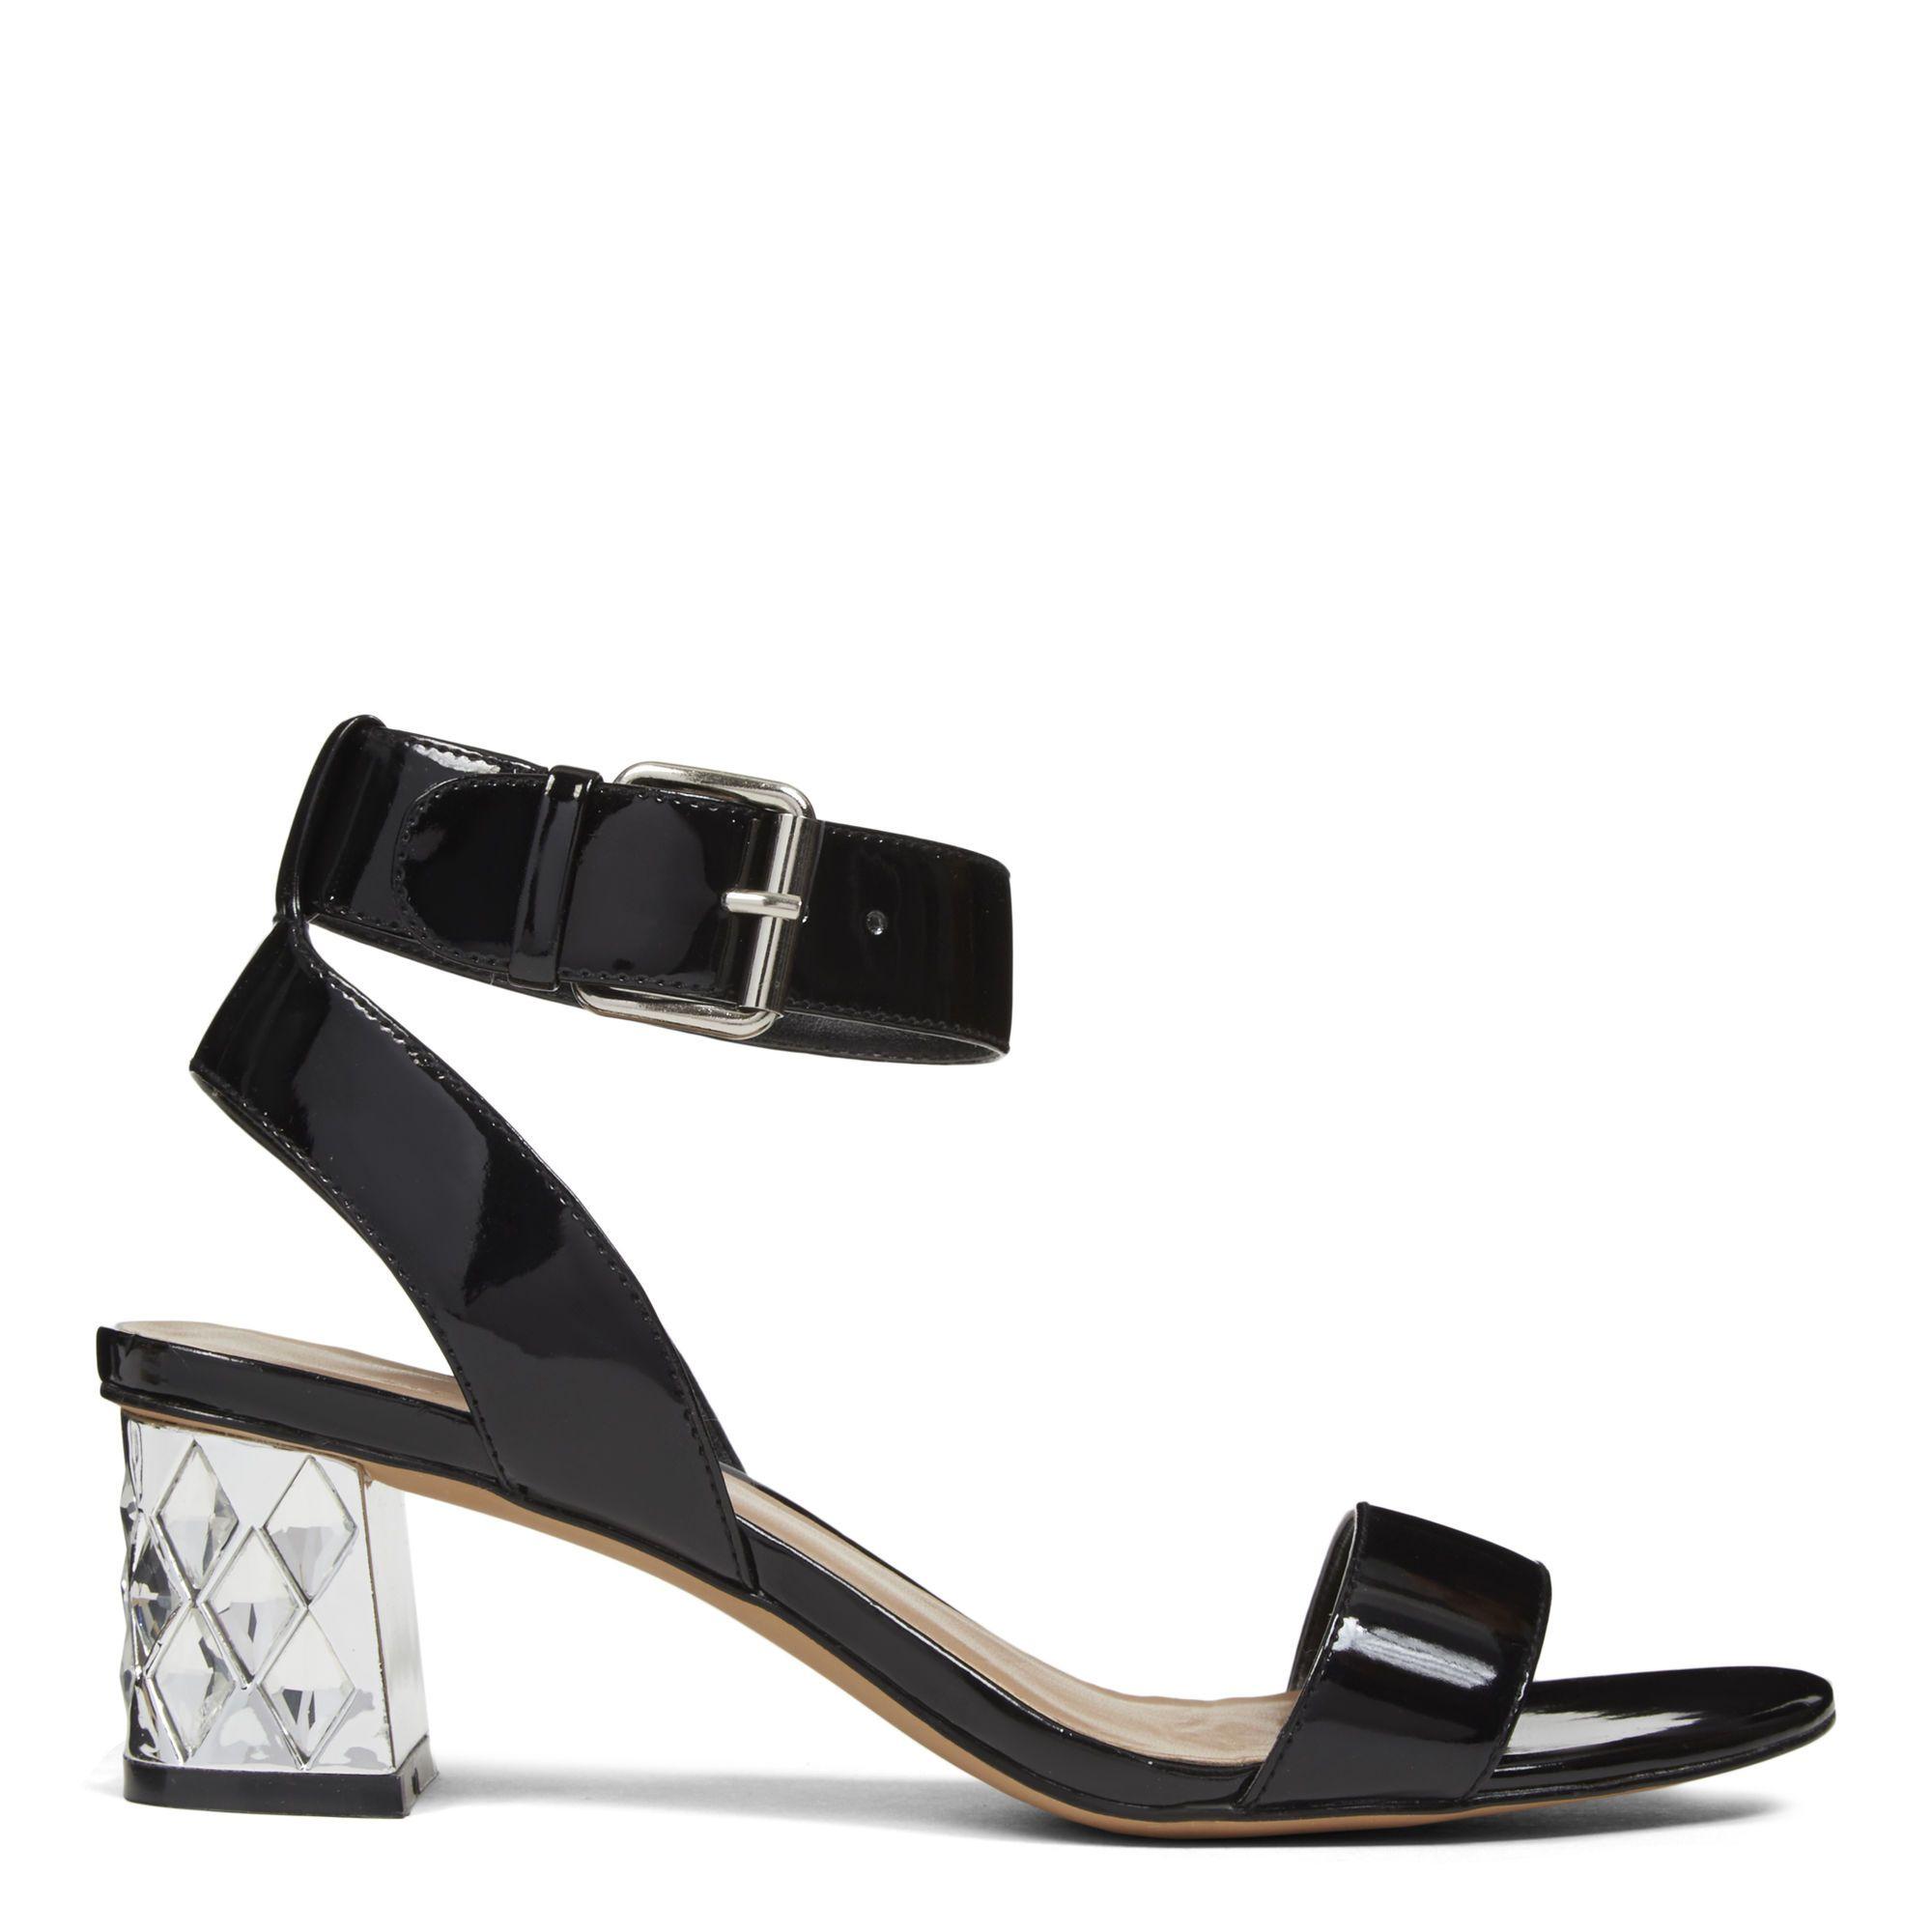 Black sandals nine west - Black Patent Shineon Open Toe Sandals Nine West